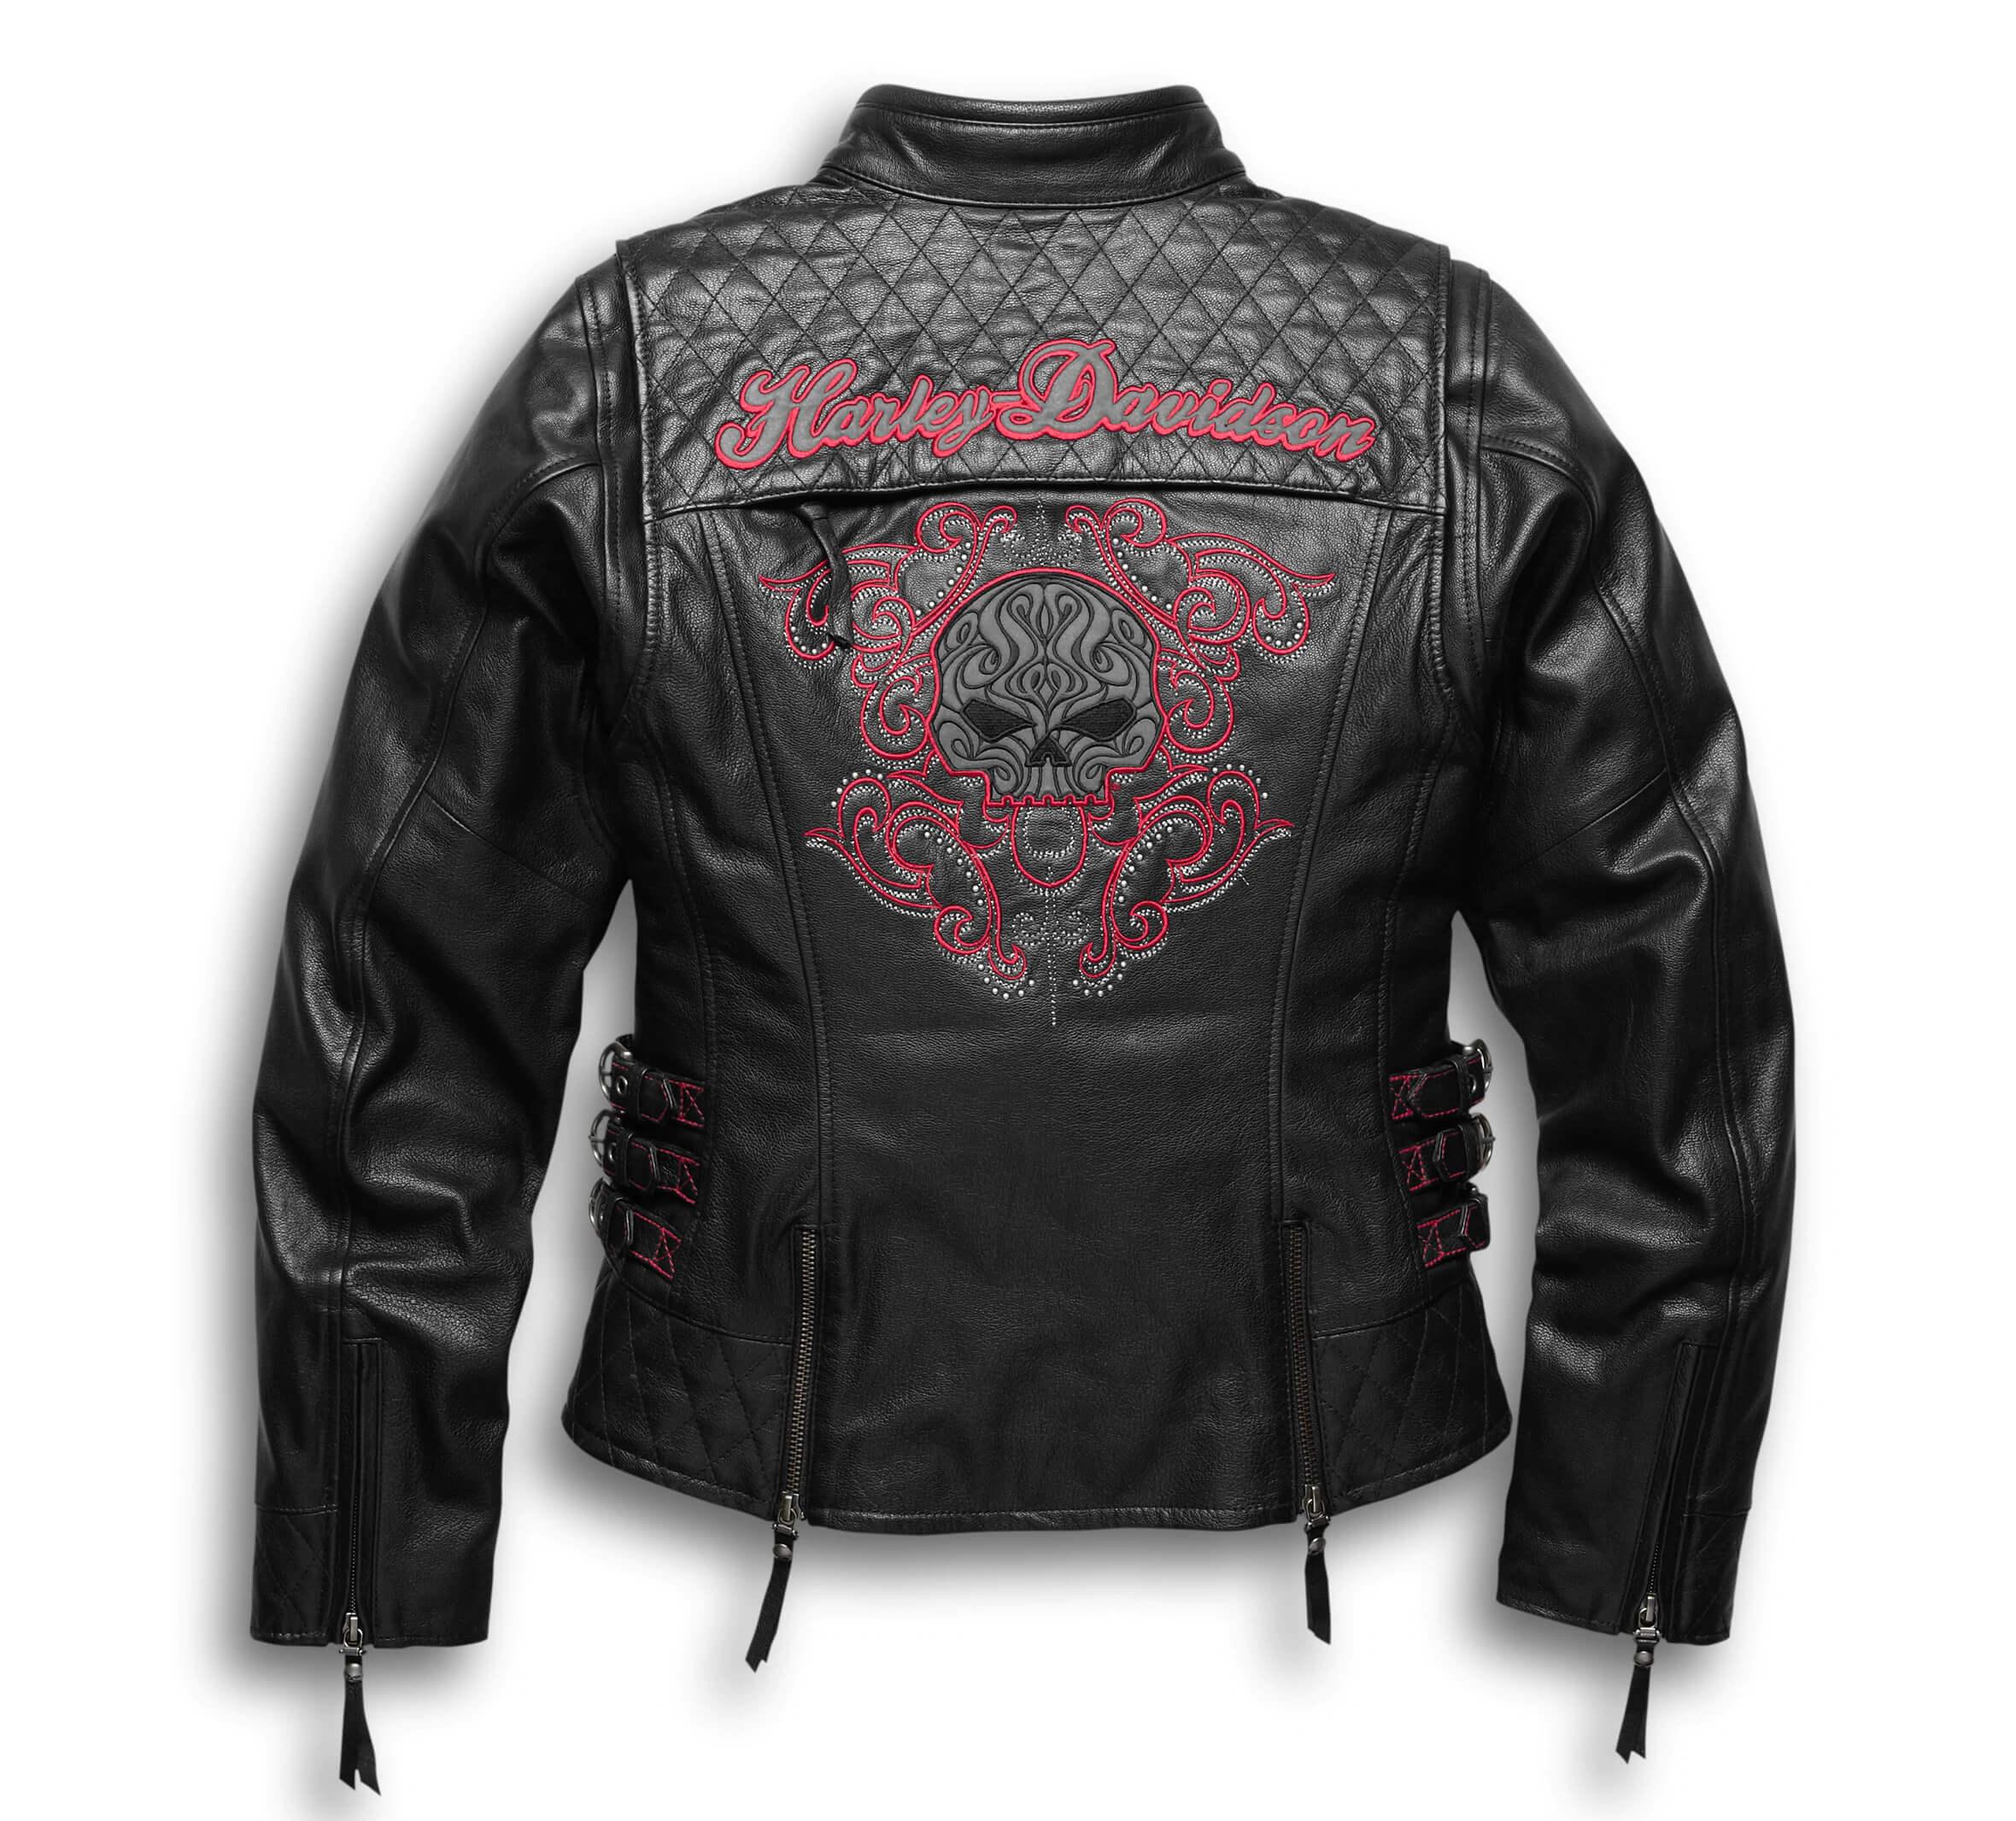 Black Harley Davidson Motorcycle Skull Leather Jacket